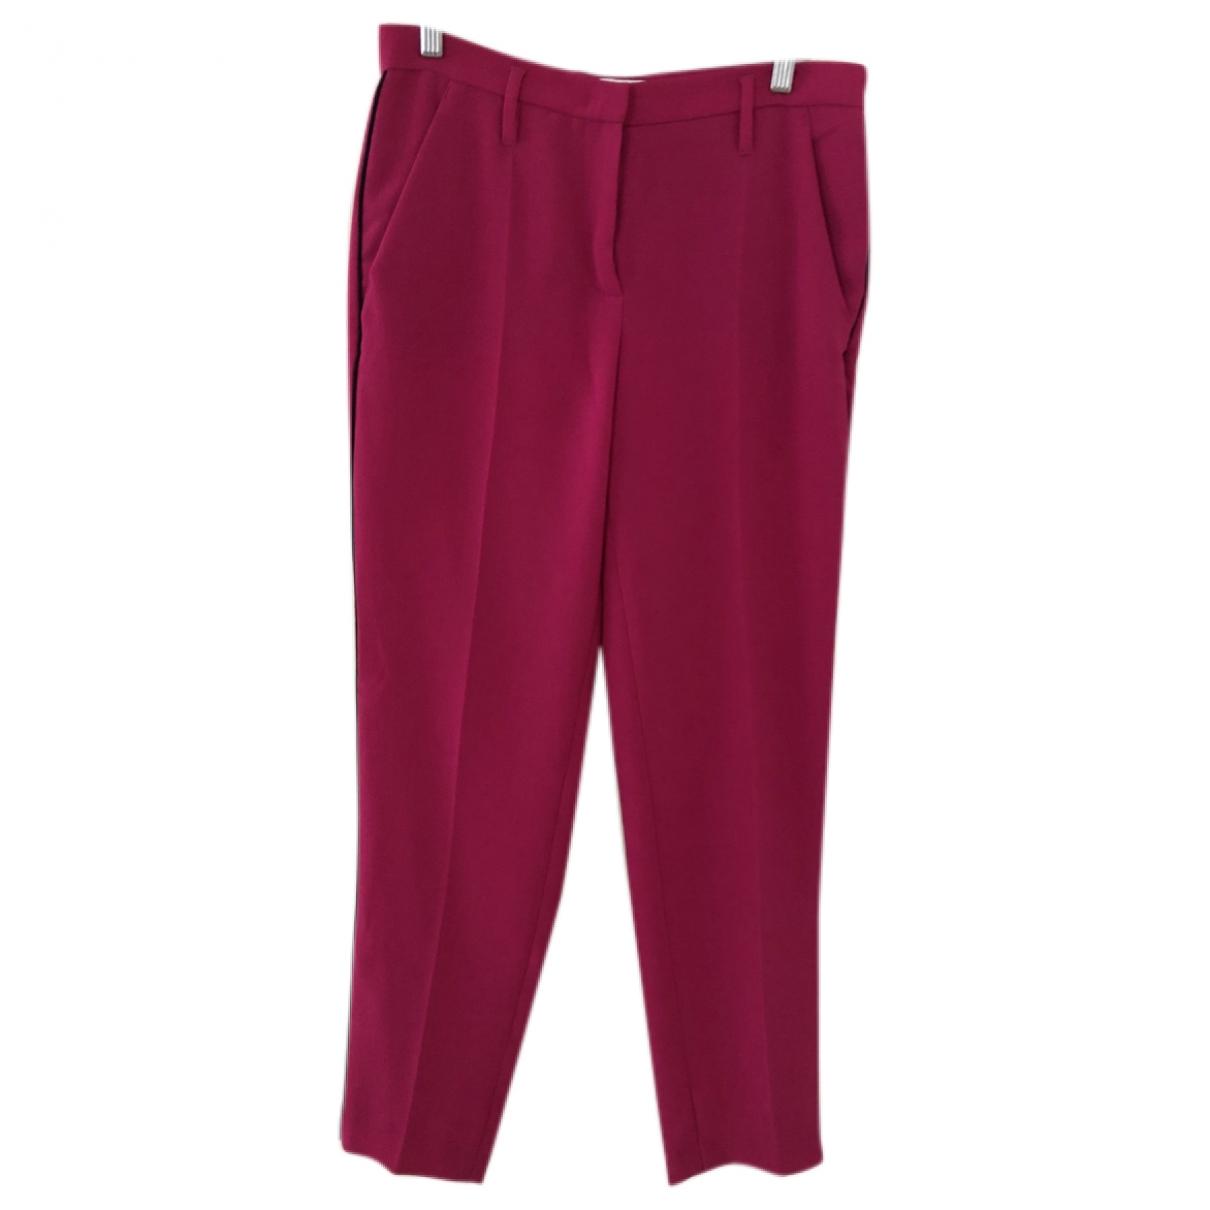 Sonia Rykiel \N Pink Trousers for Women M International